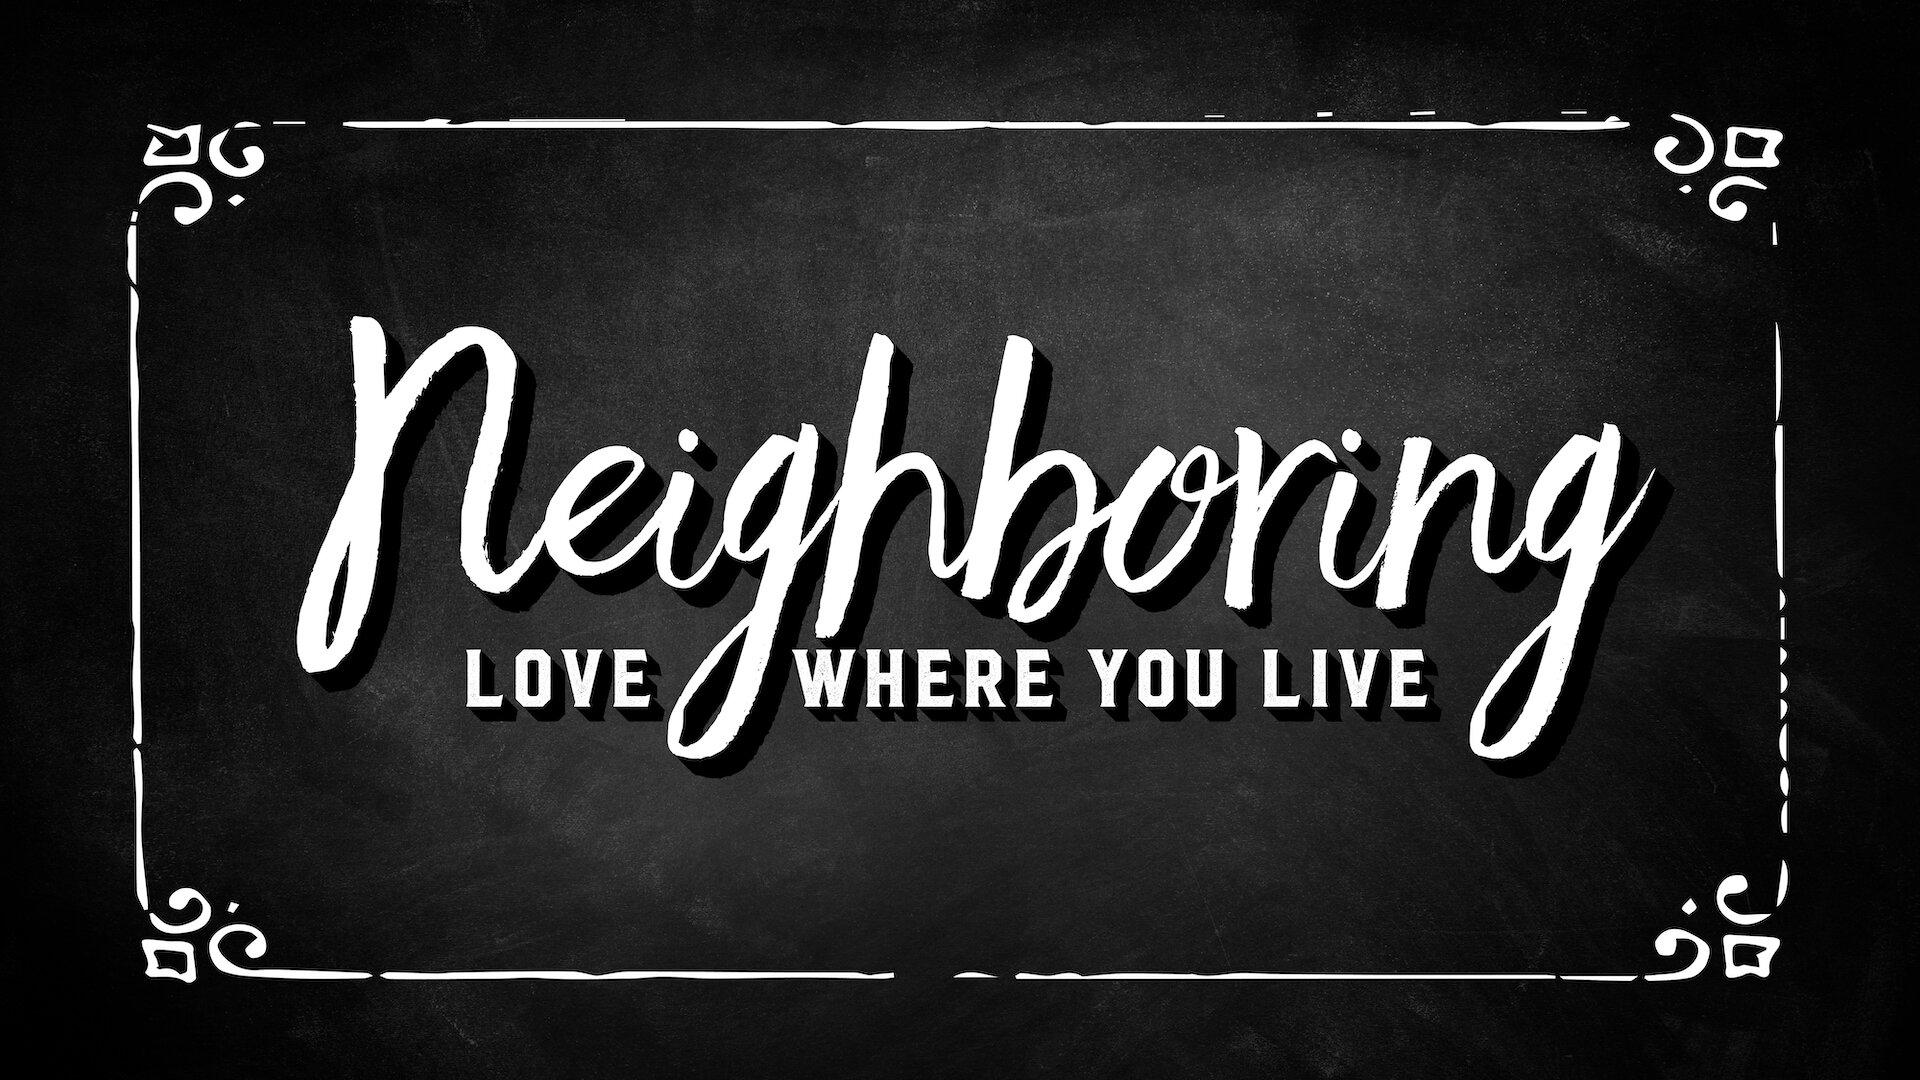 Neighboring Love Where you Live-01.jpg